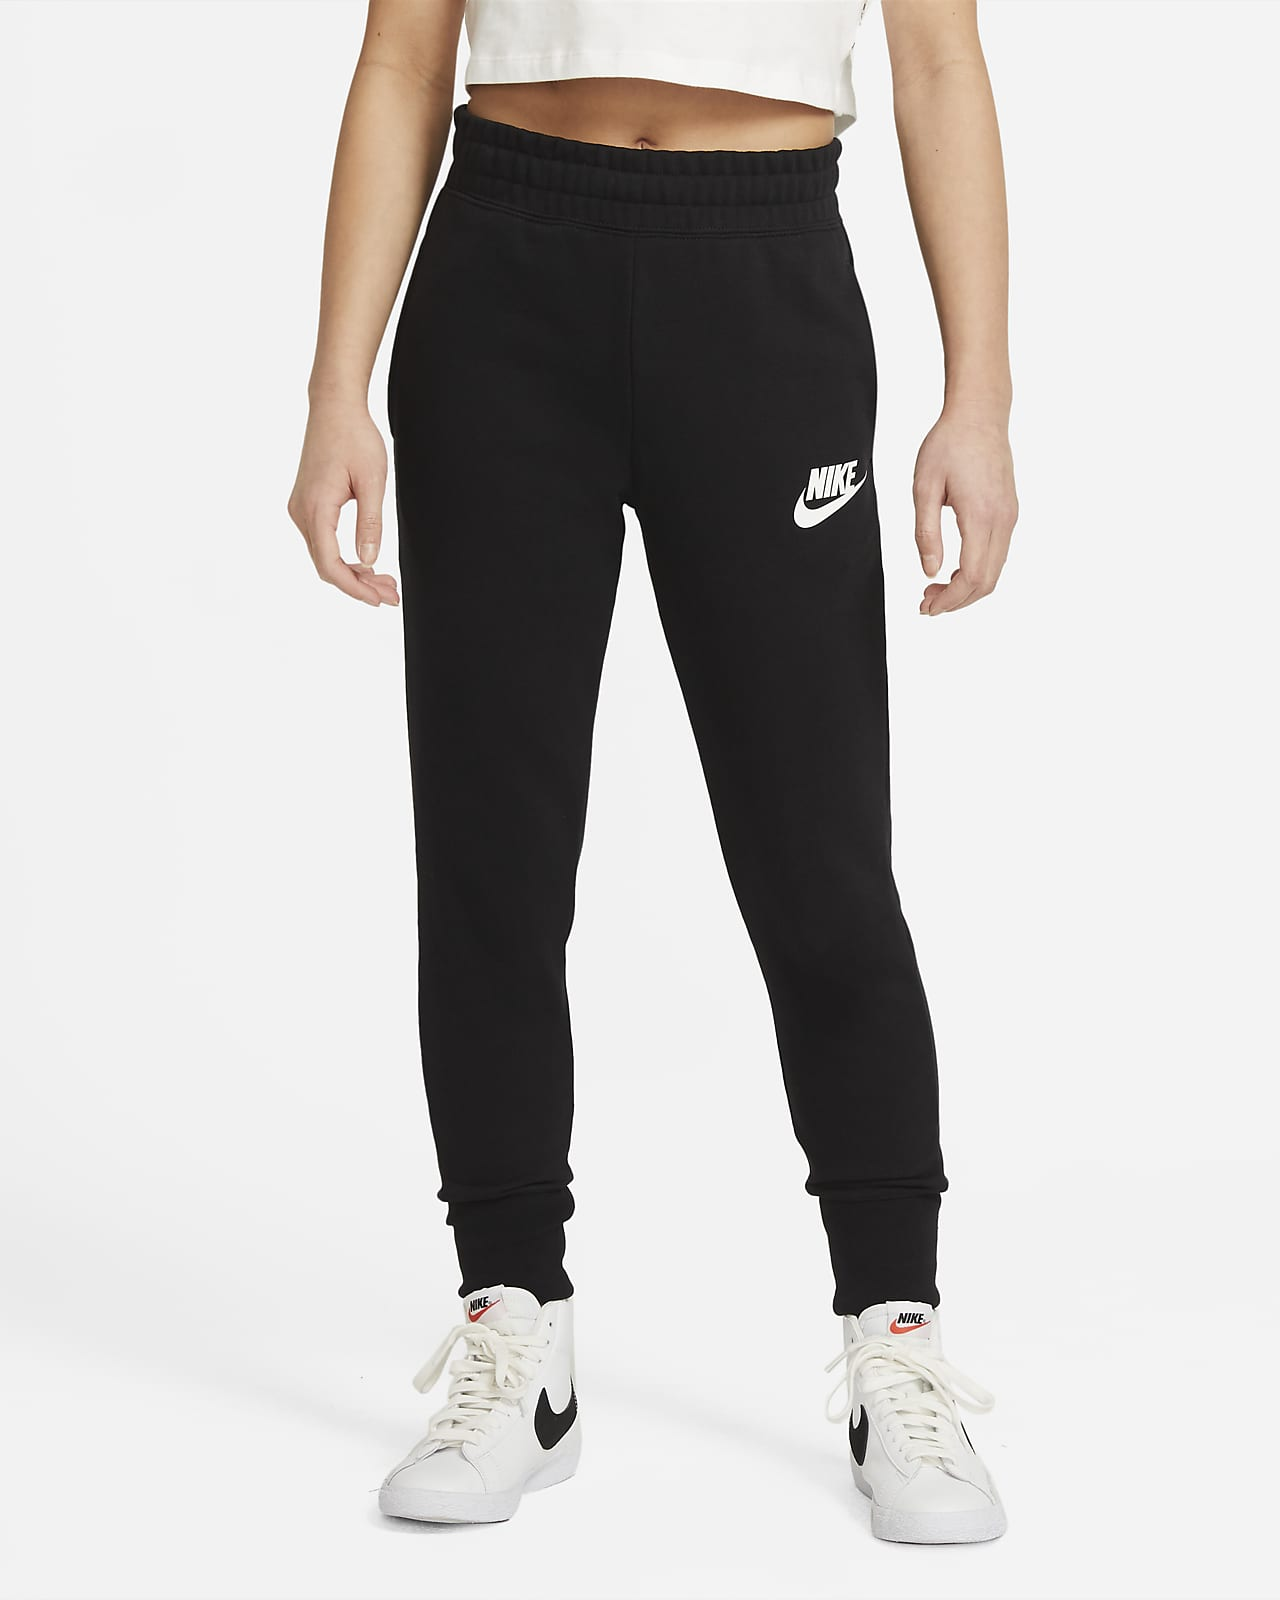 Byxor i frotté Nike Sportswear Club för ungdom (tjejer)